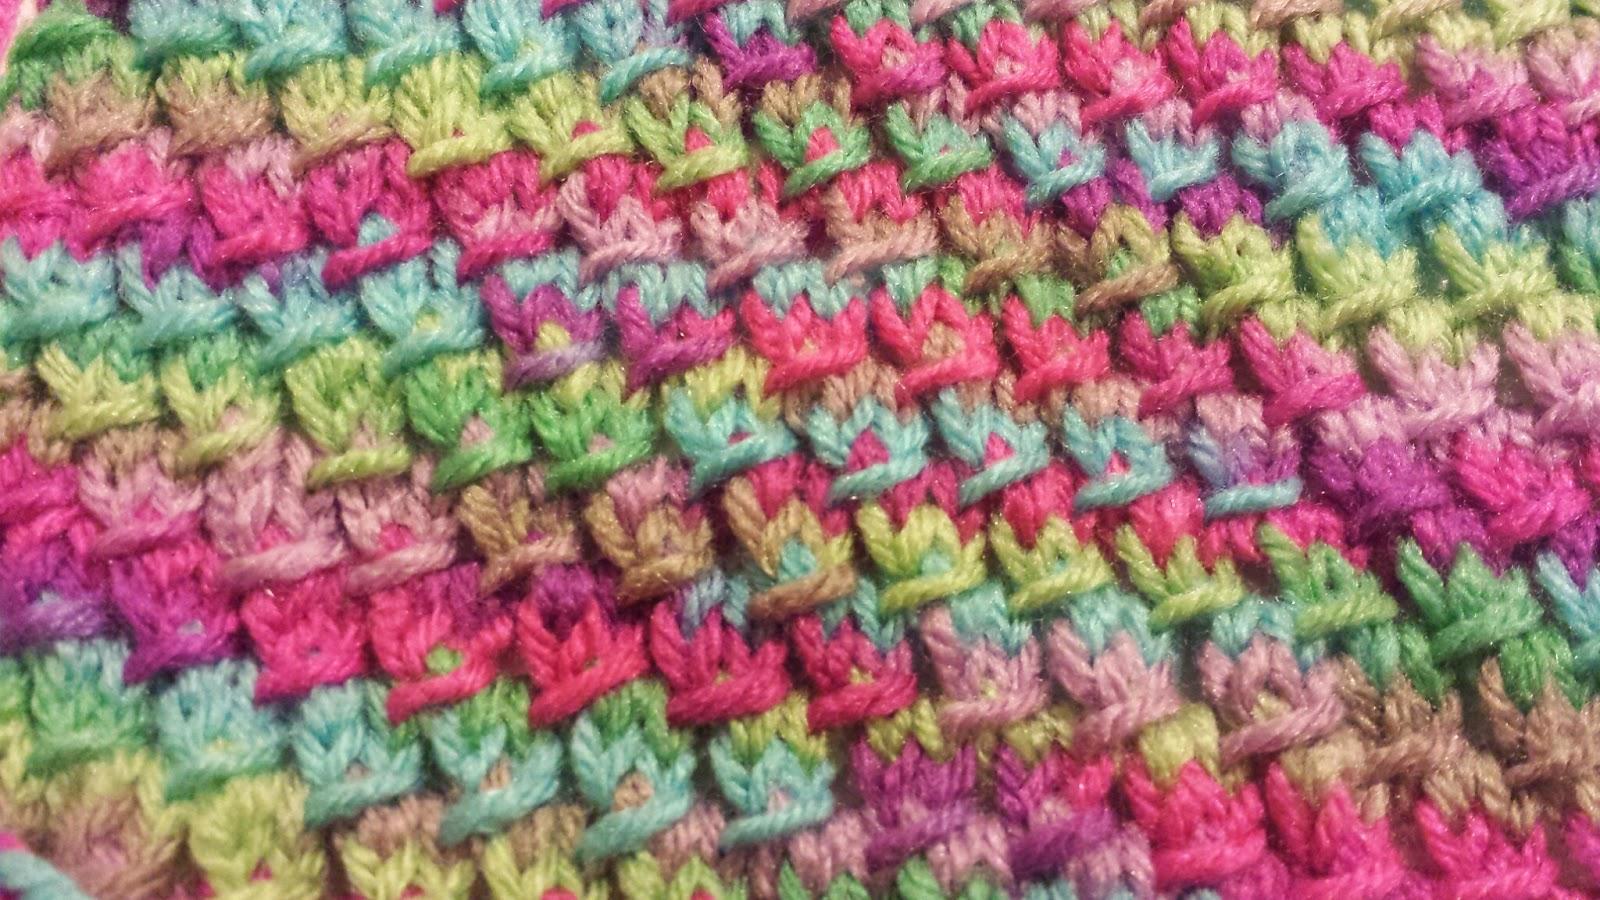 My Patchwork Quilt: CROCUS BUDS - A KNIT PATTERN